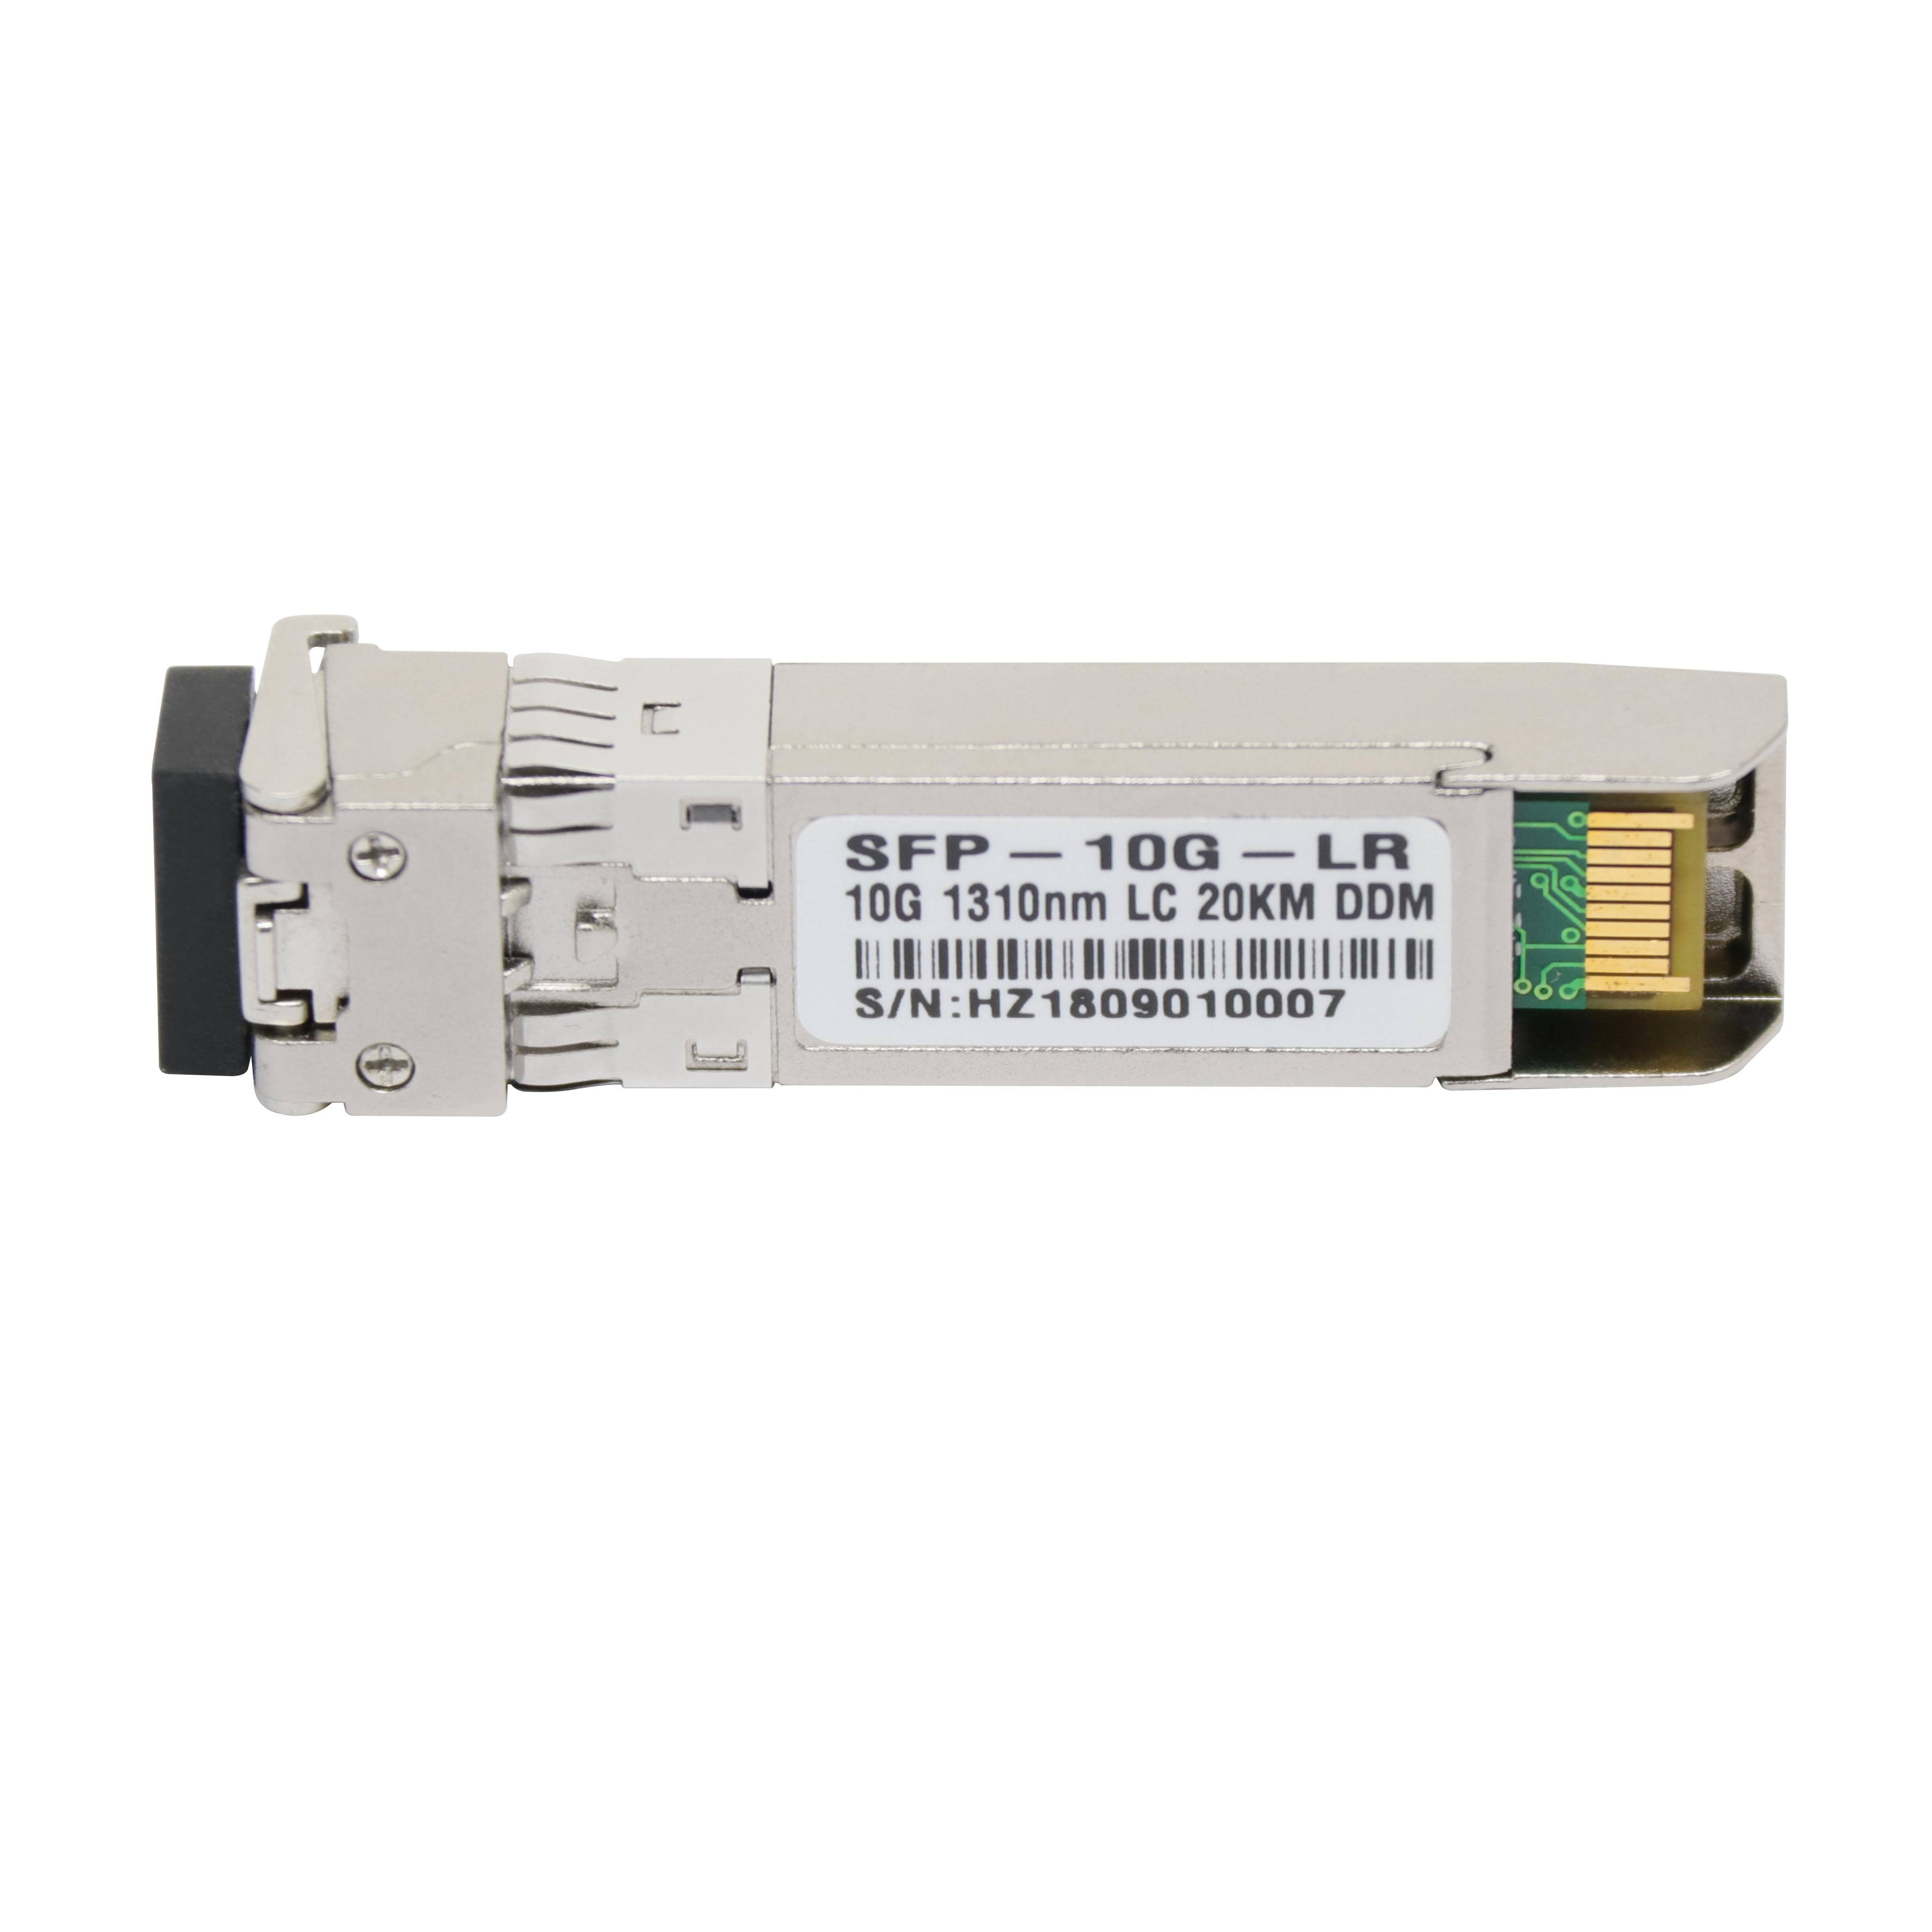 BIDI 40km for Cisco Catalyst 2960-XR Series Compatible Pair 10G SFP